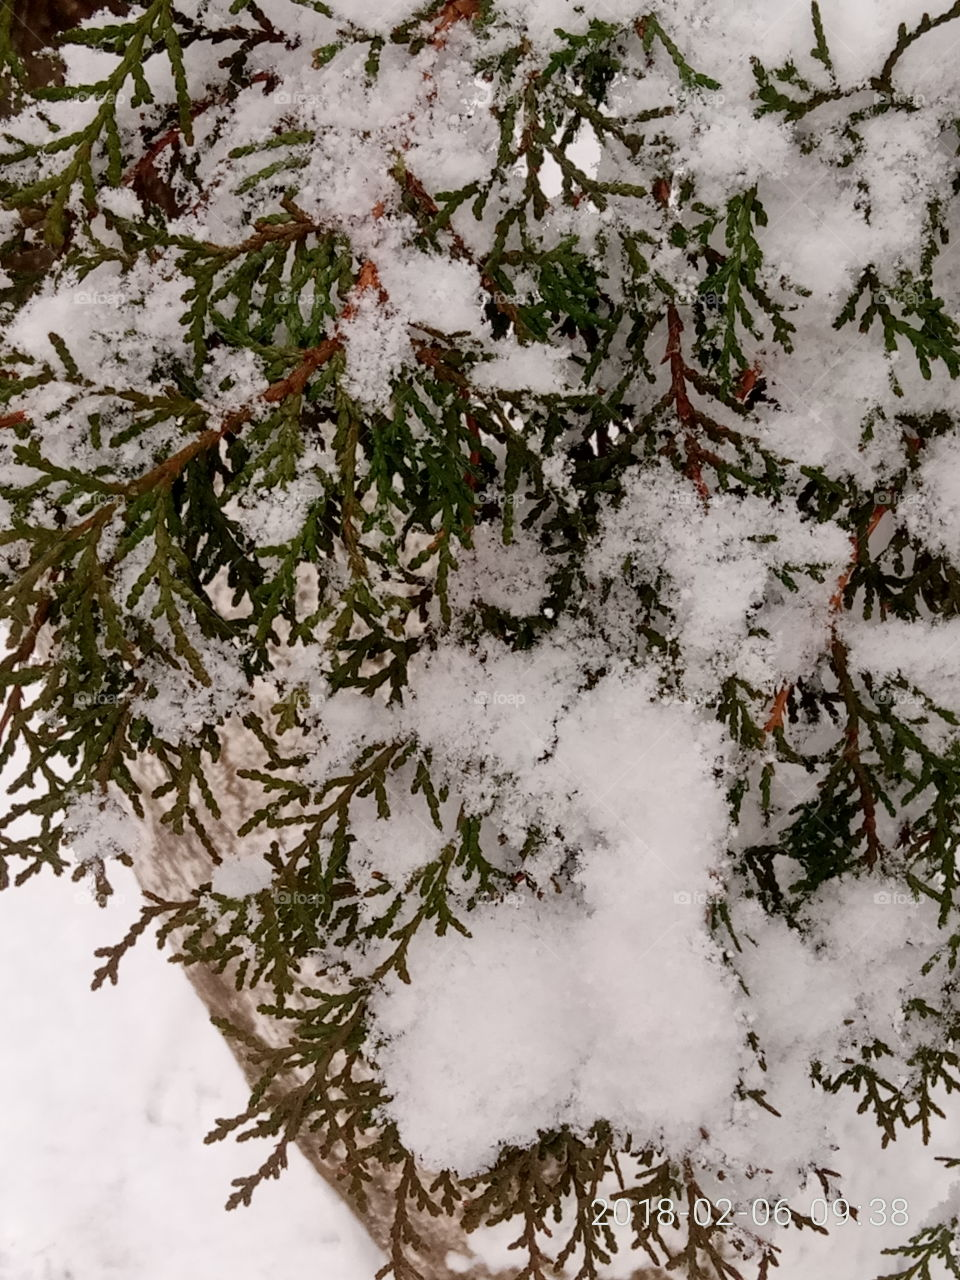 Tree, Winter, No Person, Christmas, Desktop